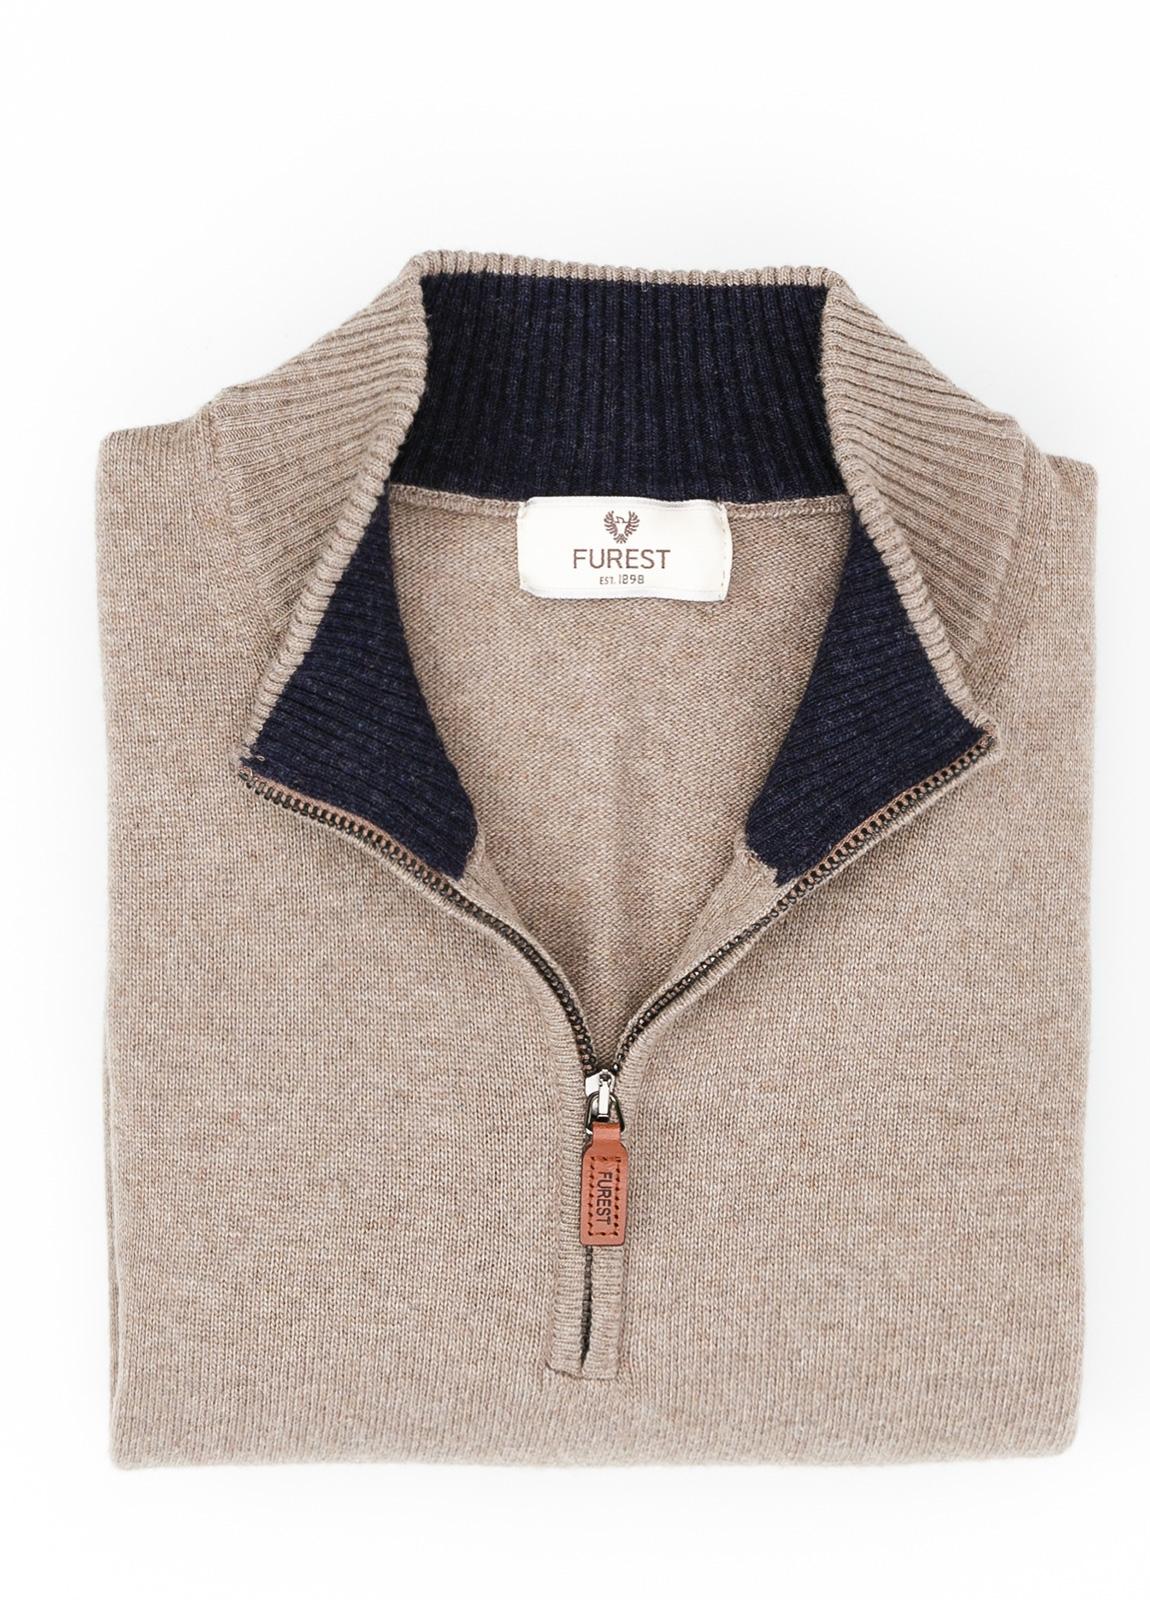 Jersey liso cuello cremallera, color arena, 40% lana merino, 30% viscosa, 10% cachemire - Ítem1